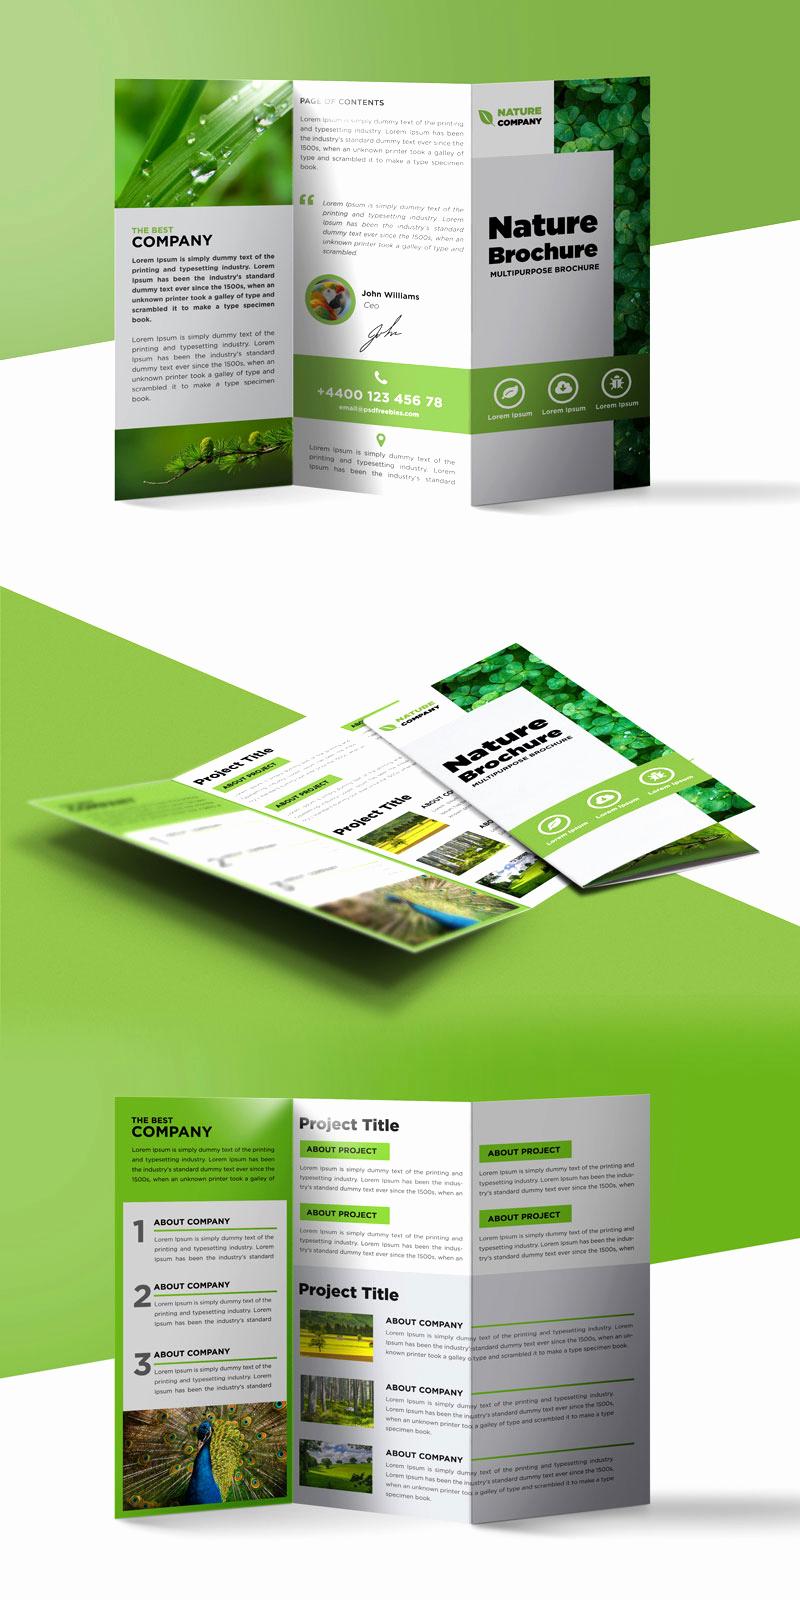 Tri Fold Brochure Template Psd Elegant Nature Tri Fold Brochure Template Free Psd